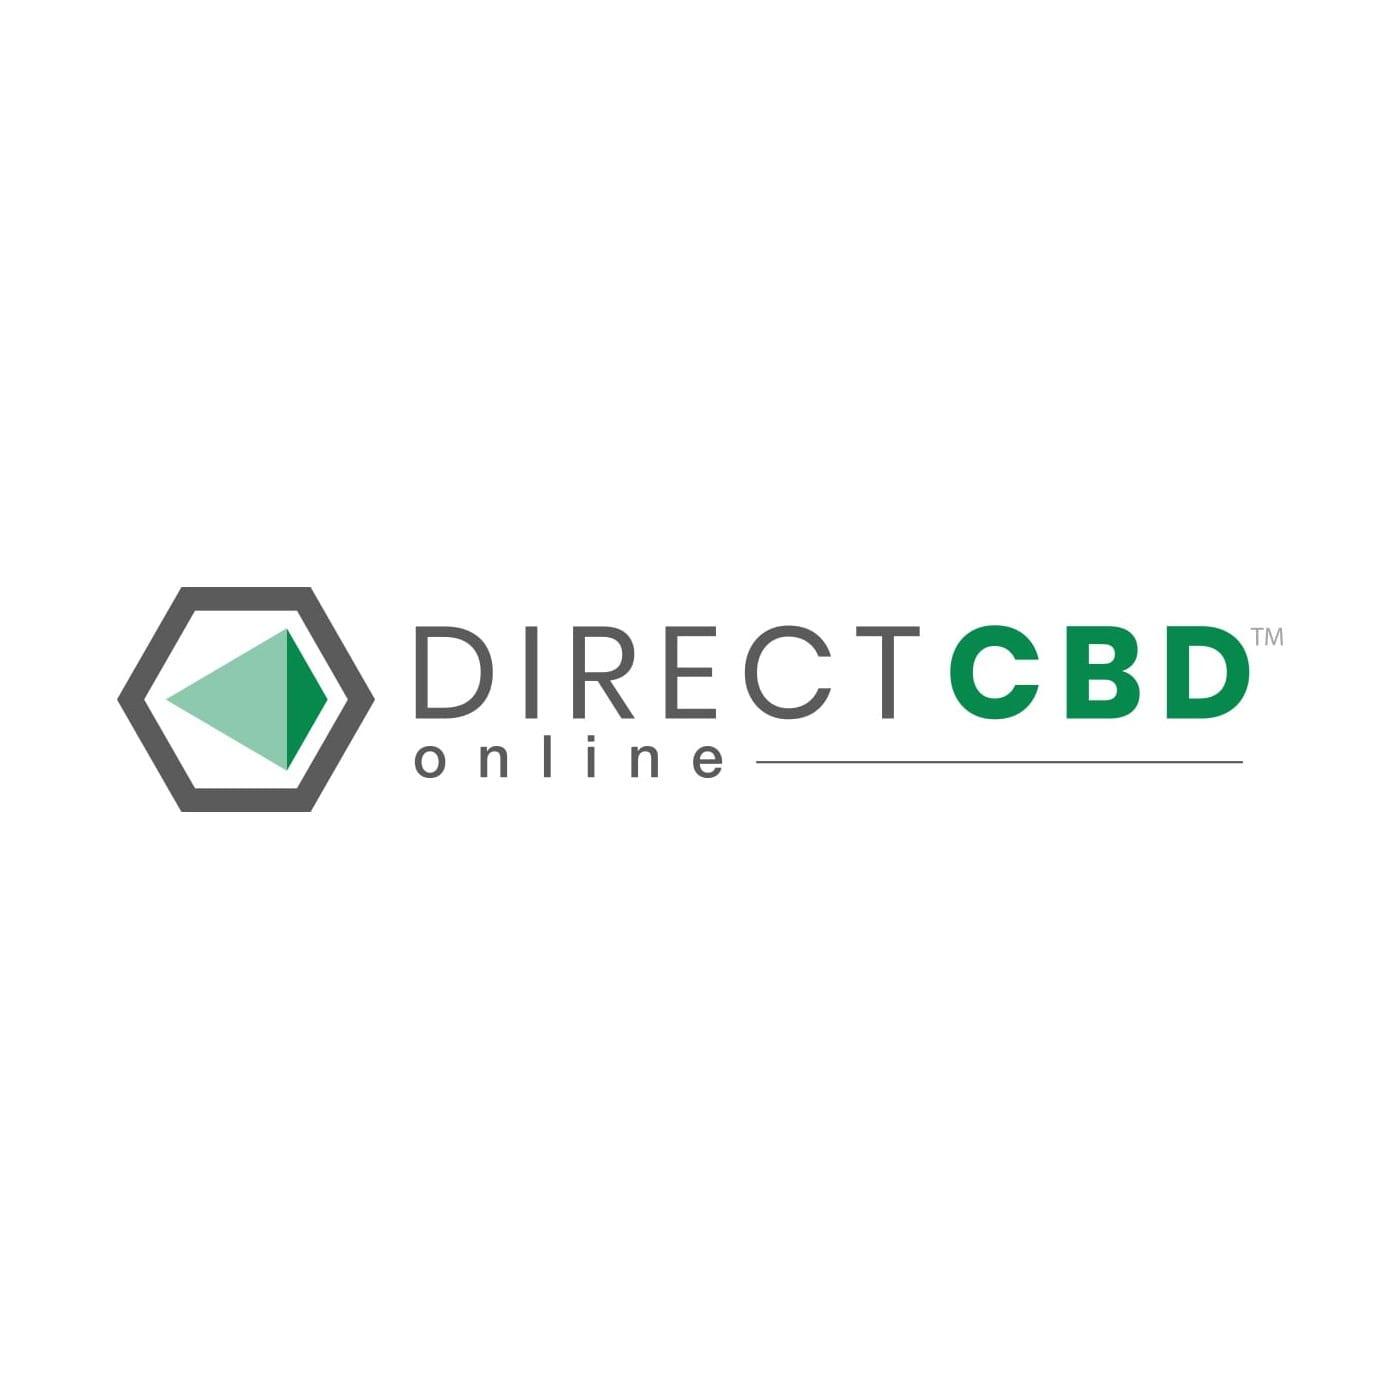 Direct CBD Online: Save 10% on CBD Tinctures